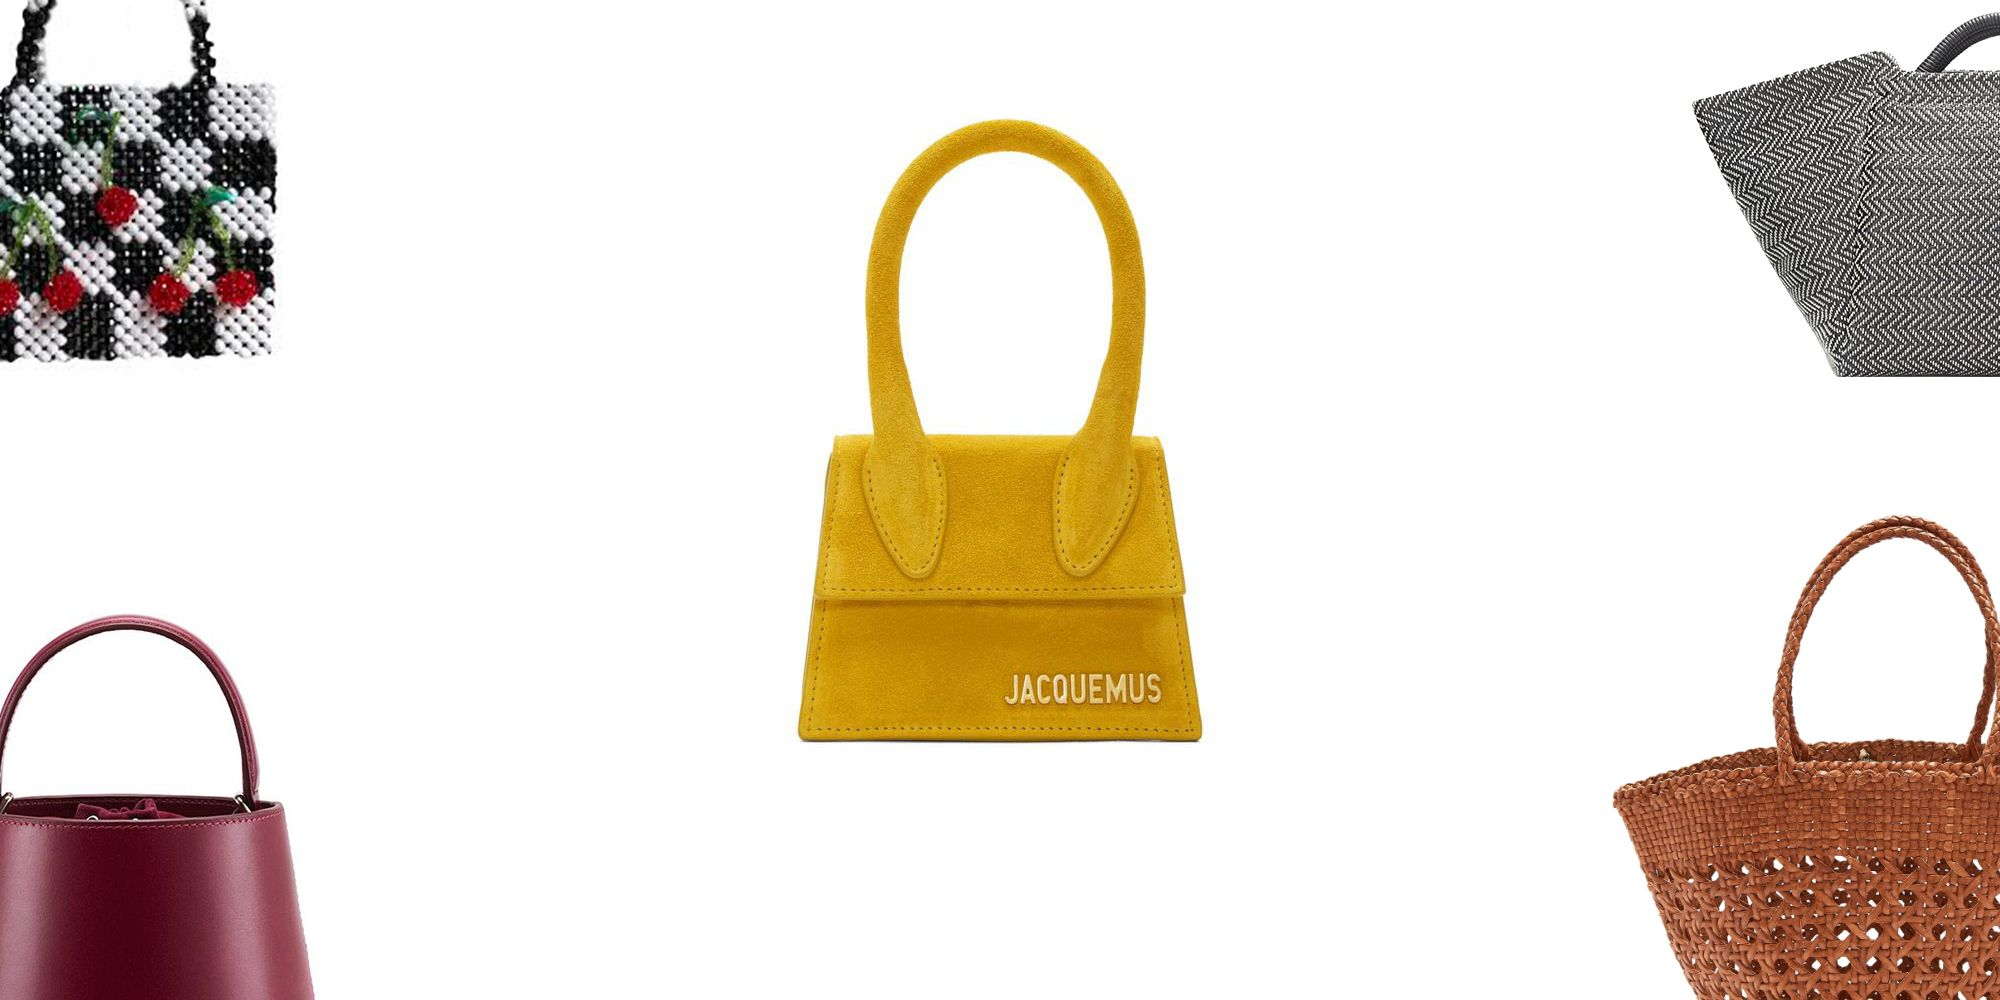 15 Cheap Designer Bags for 2018 - 15 Future